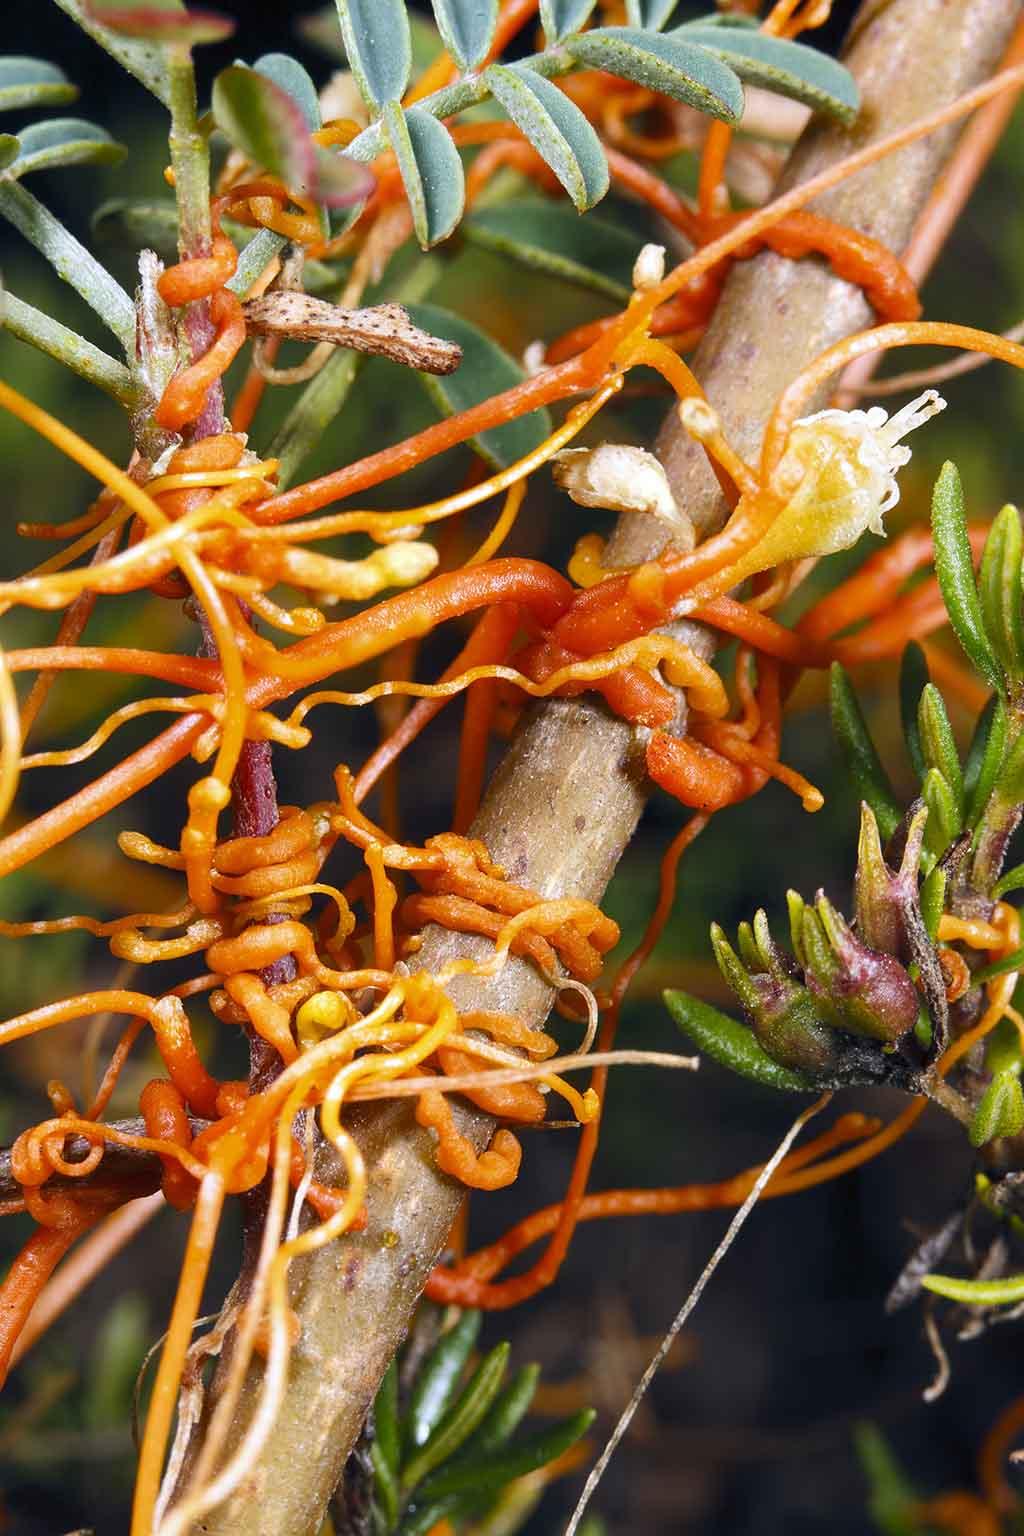 Dodder (Cuscuta americana) is a parasitic climber